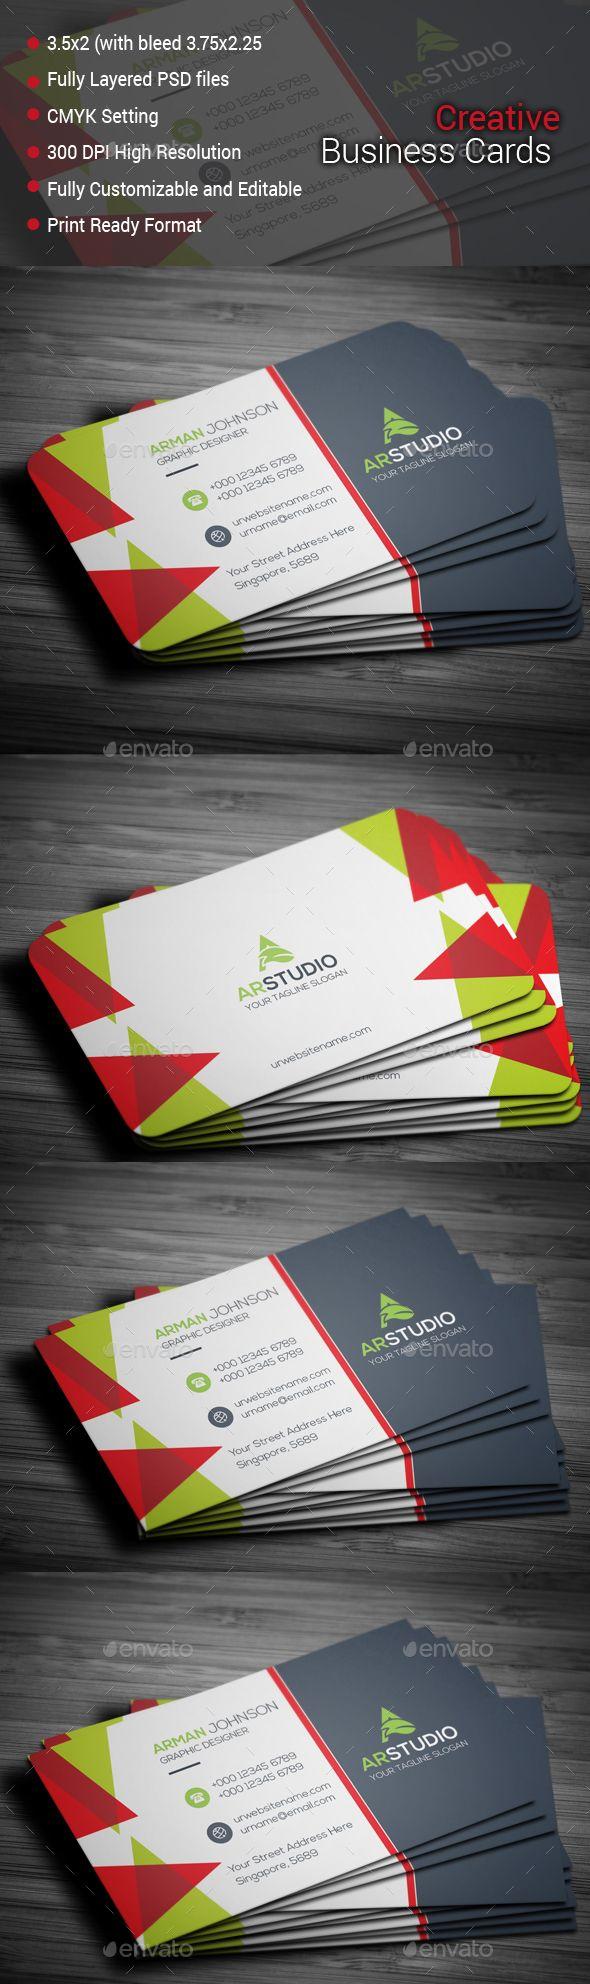 3023 best Nice Business Cards on Pinterest images on Pinterest ...